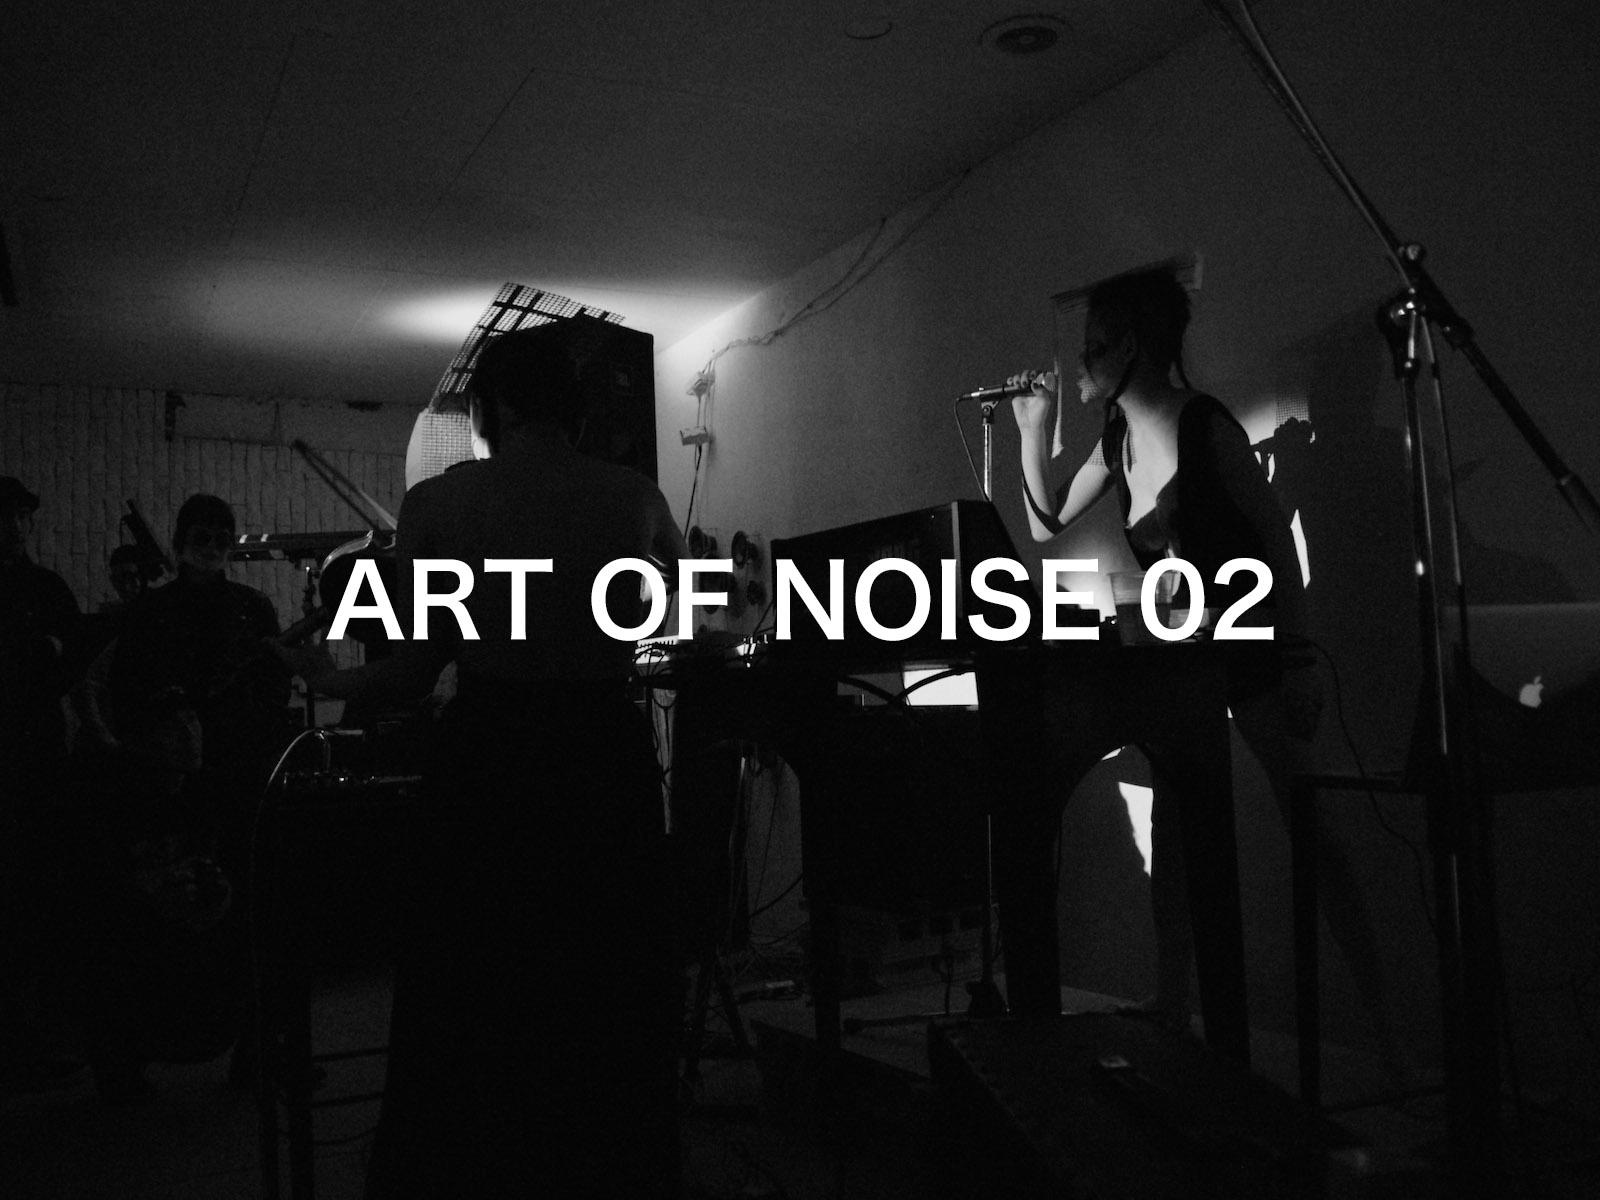 ART OF NOISE 02 ライブレポート